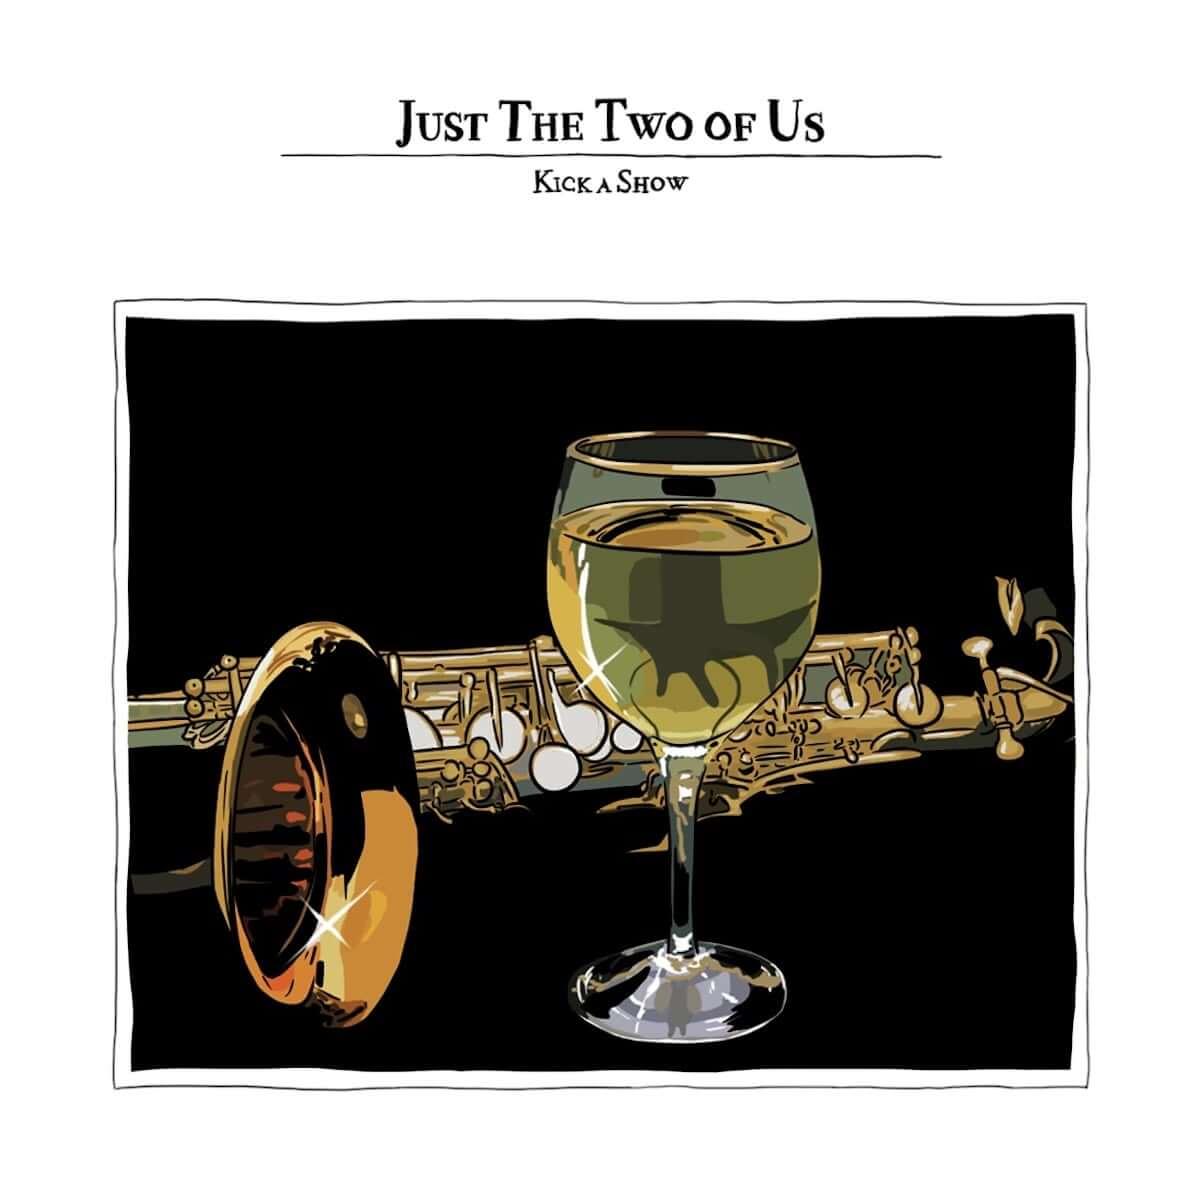 Kick a Showが超弩級ラブソング「Just The Two Of Us(クリスタルの恋人たち)」のカバーを配信リリース music181221-kickashow-1200x1200